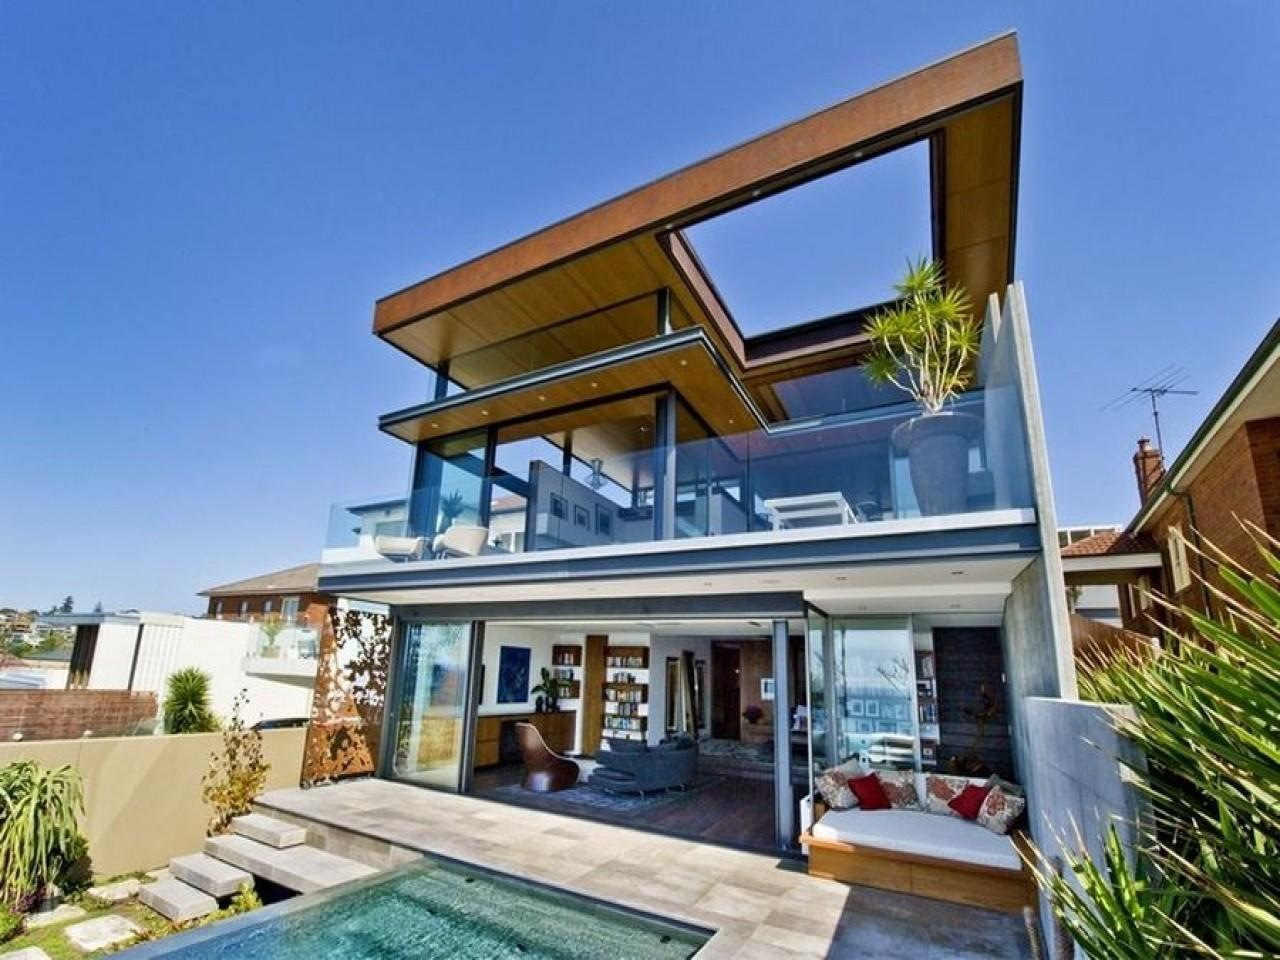 Home Interior Design Small Homes Modern Beach House Decoratorist 40377